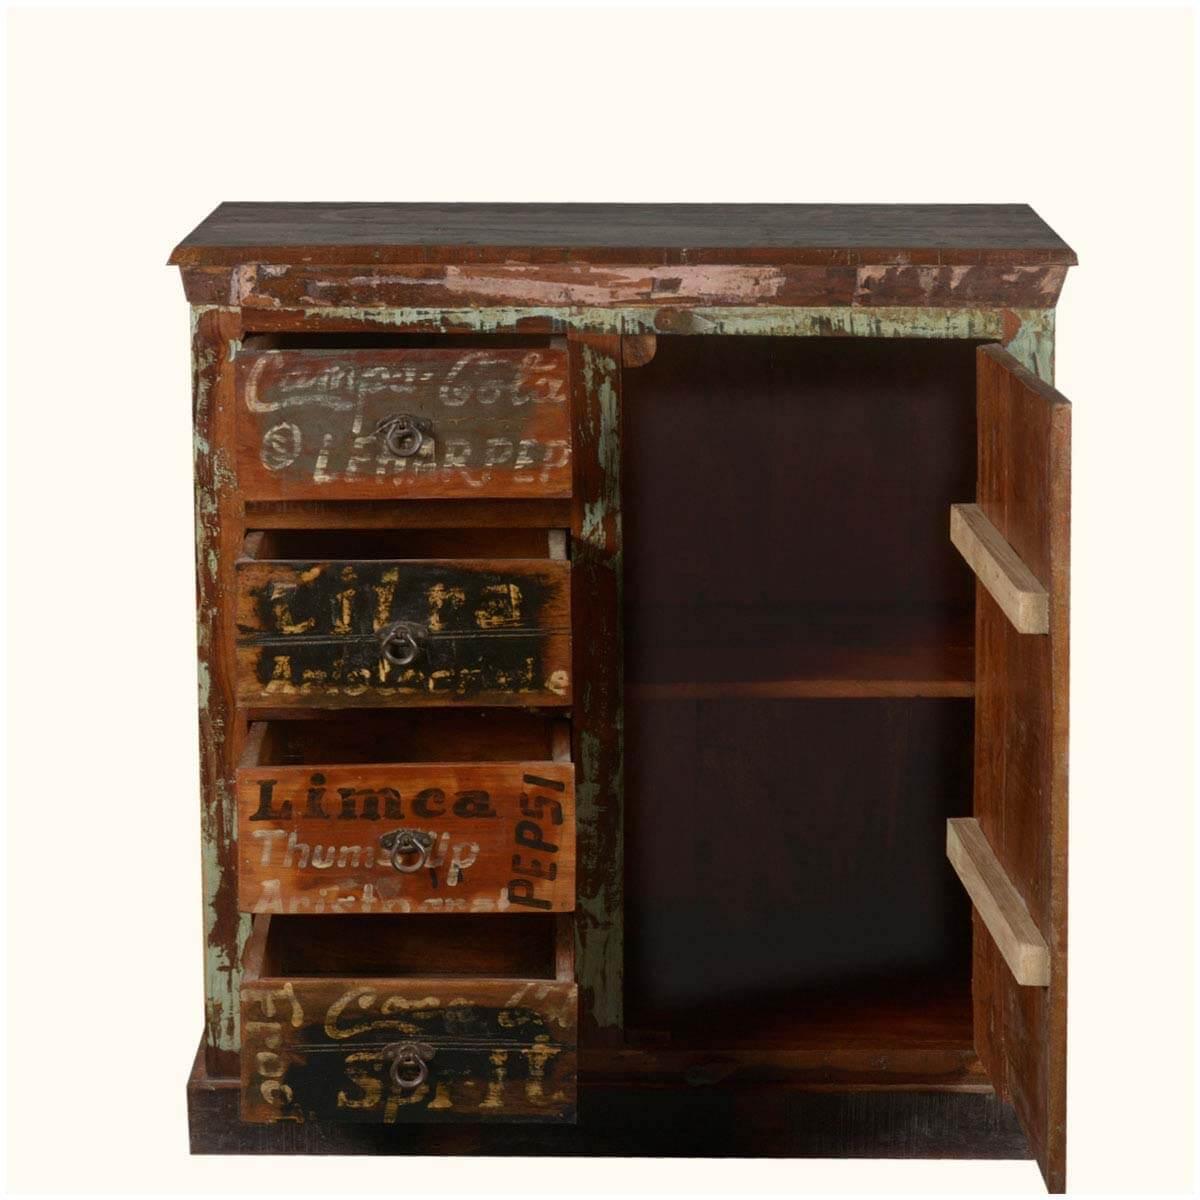 Nostalgic Market Labels Reclaimed Wood Storage Entryway